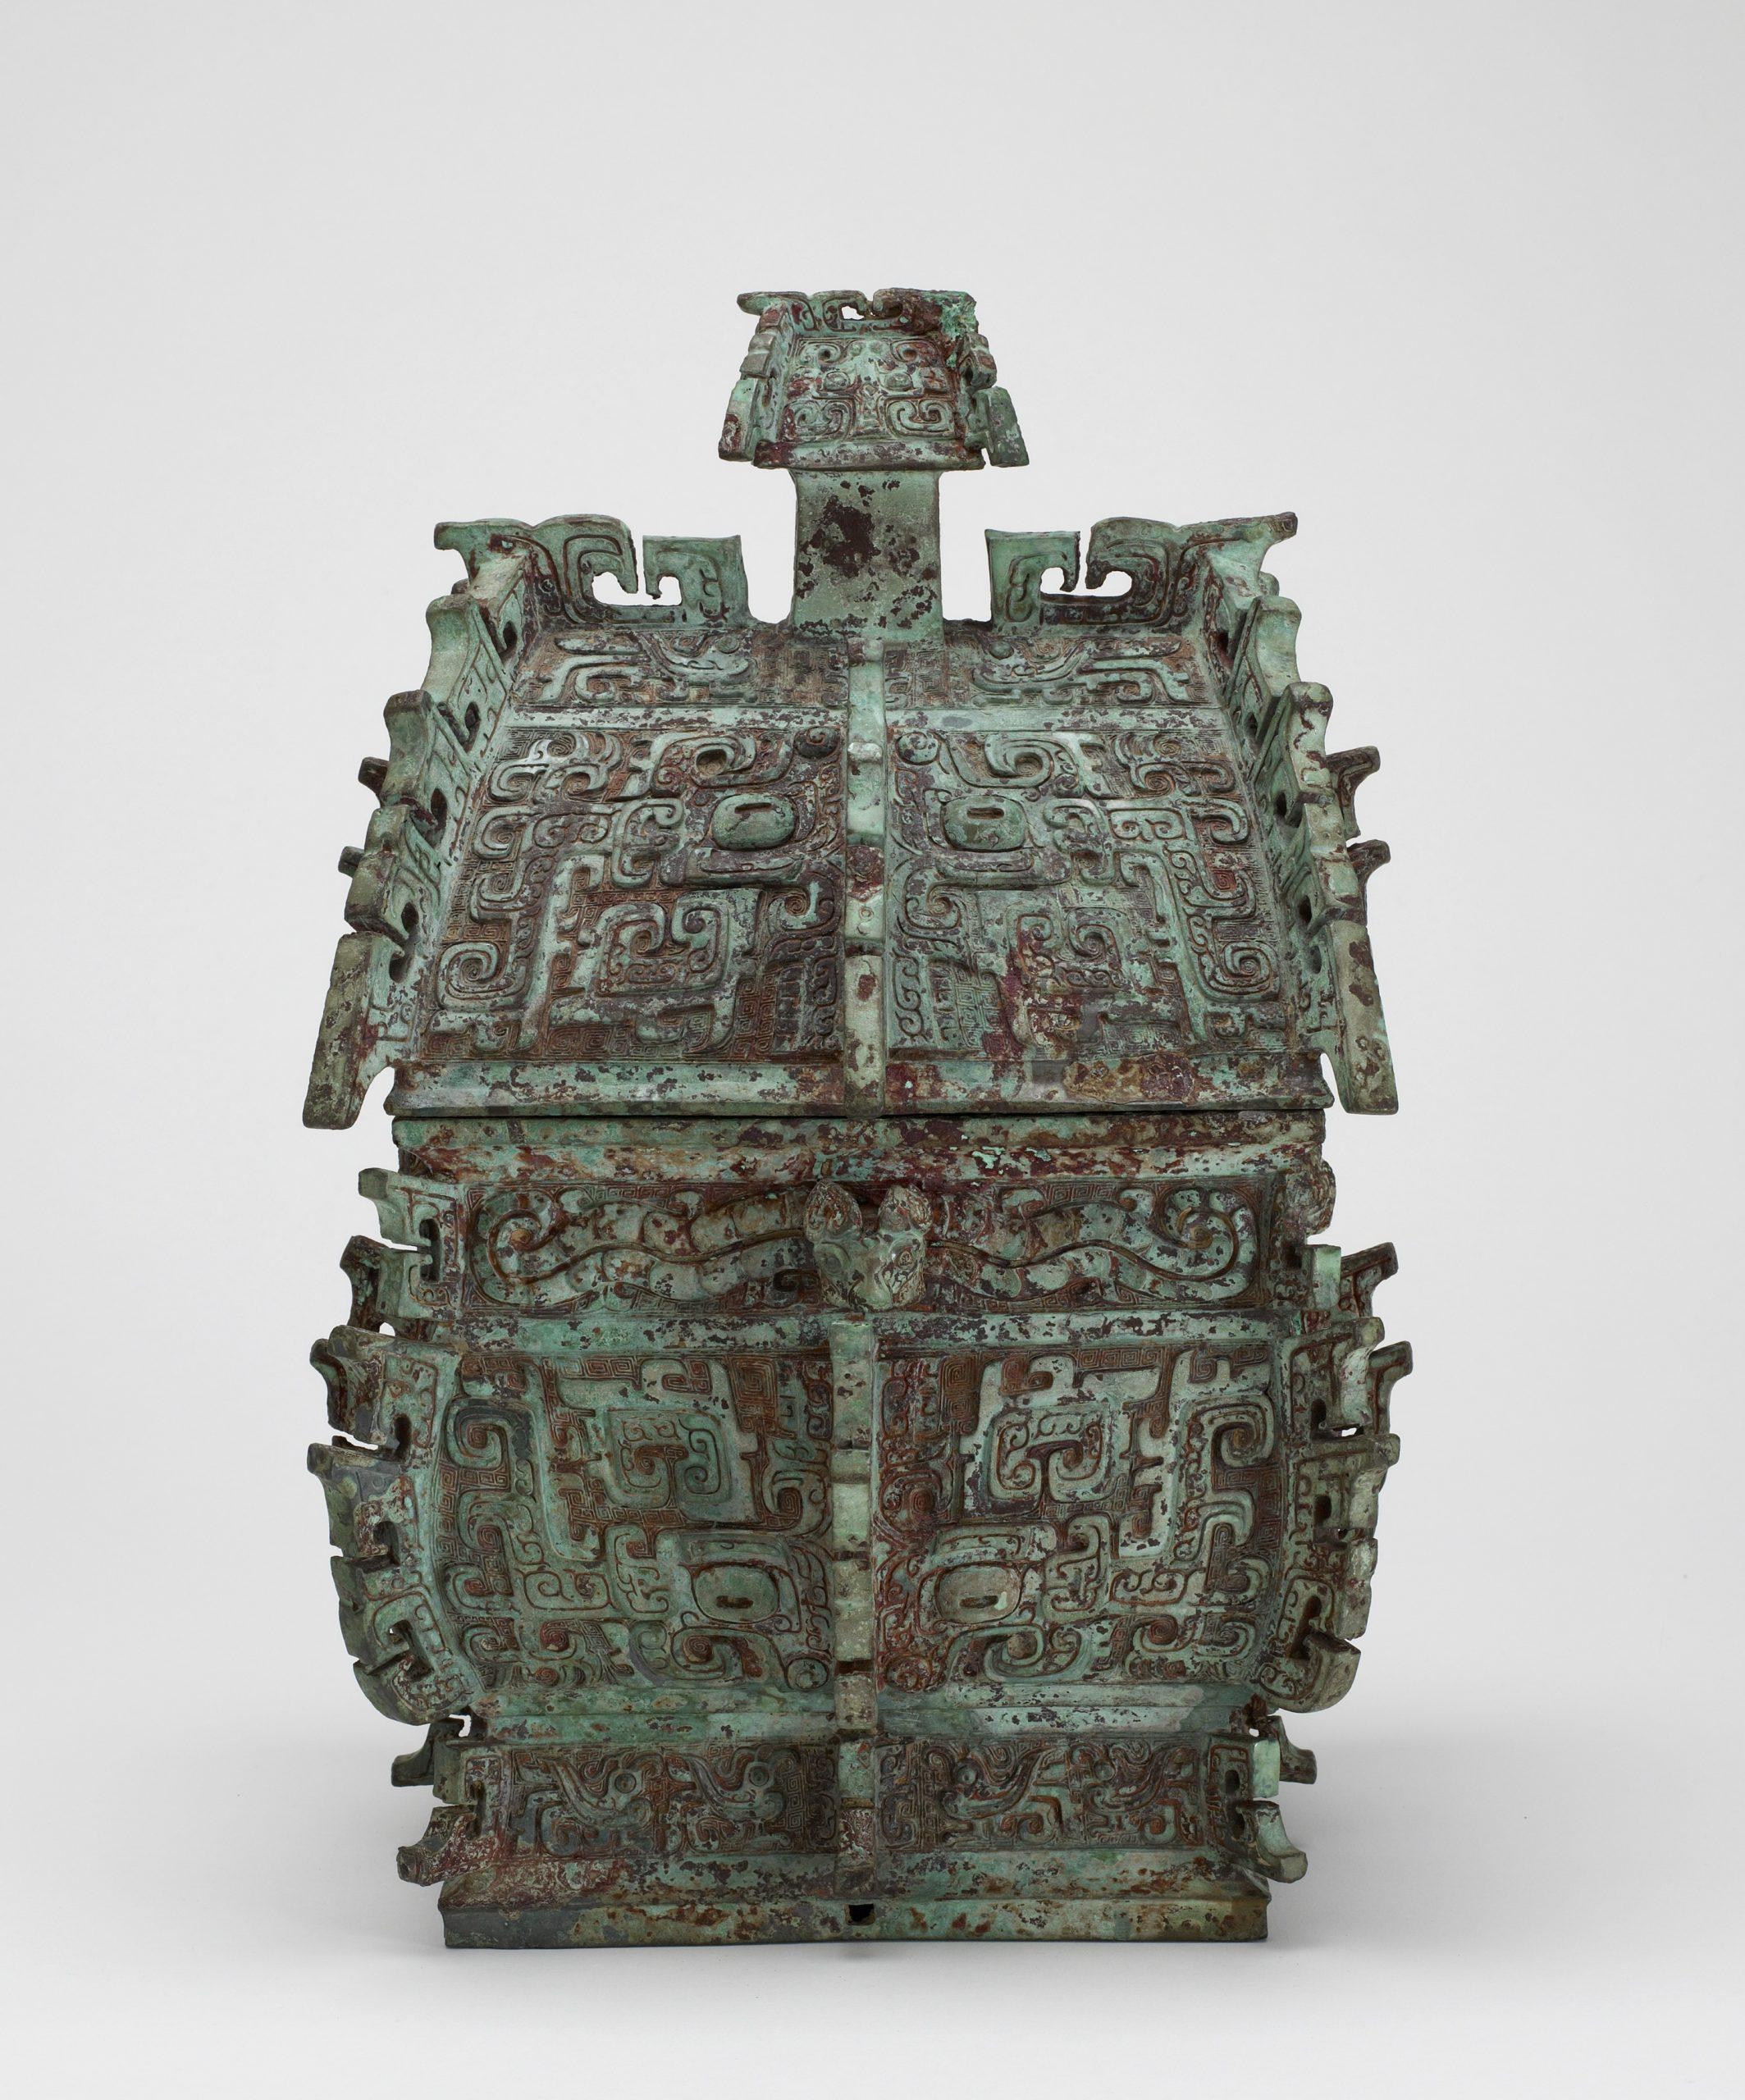 decorative metalwork vessel for wine